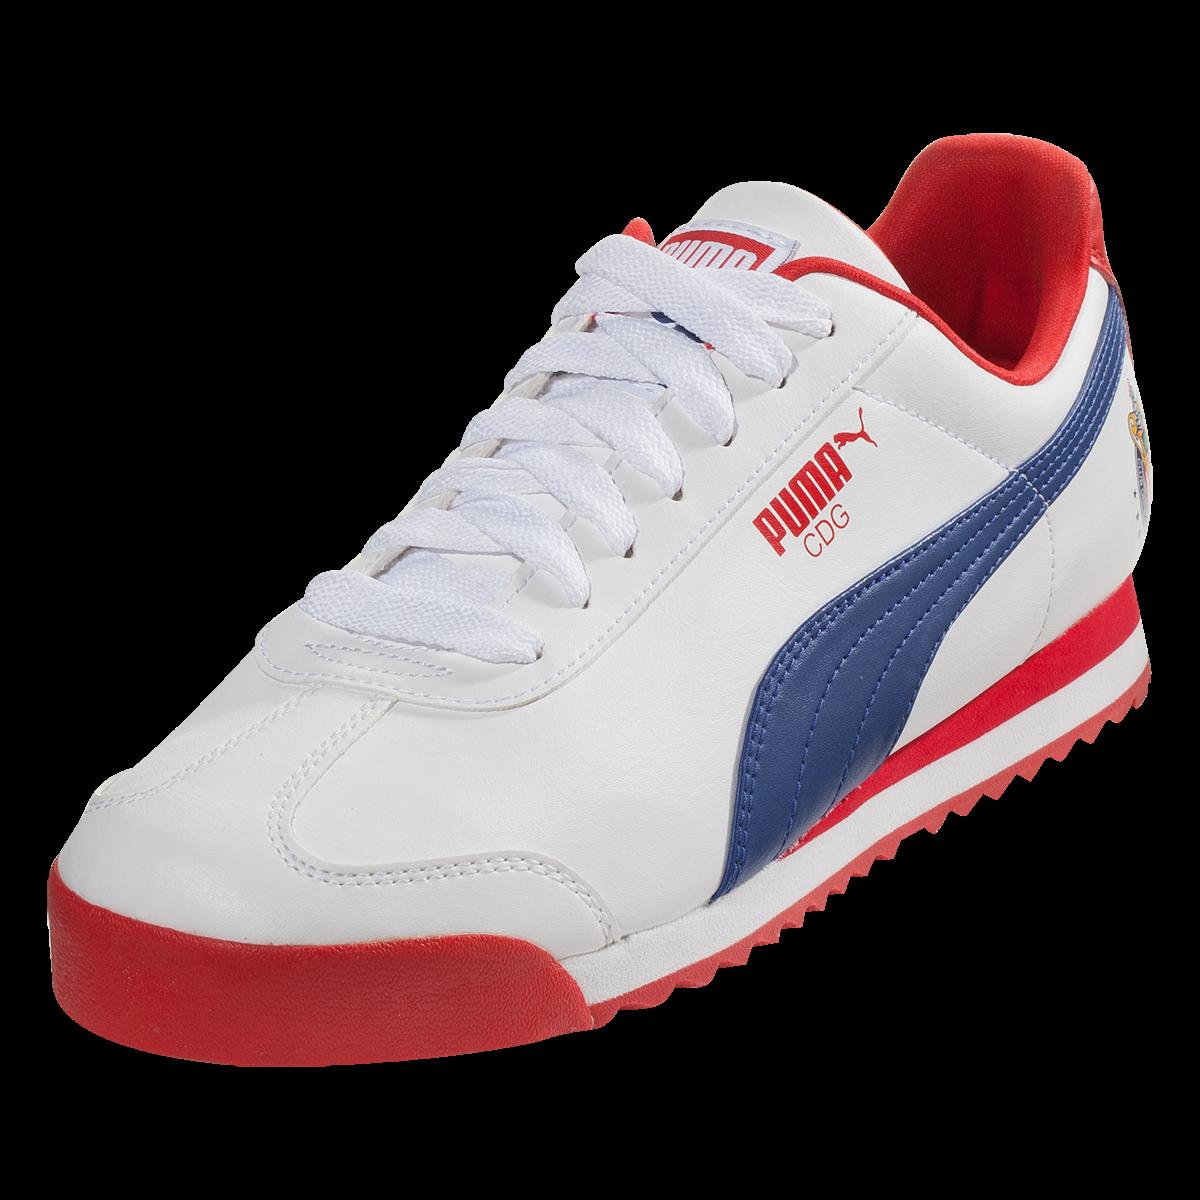 PUMA Roma CDG Lifestyle Shoe Puma White